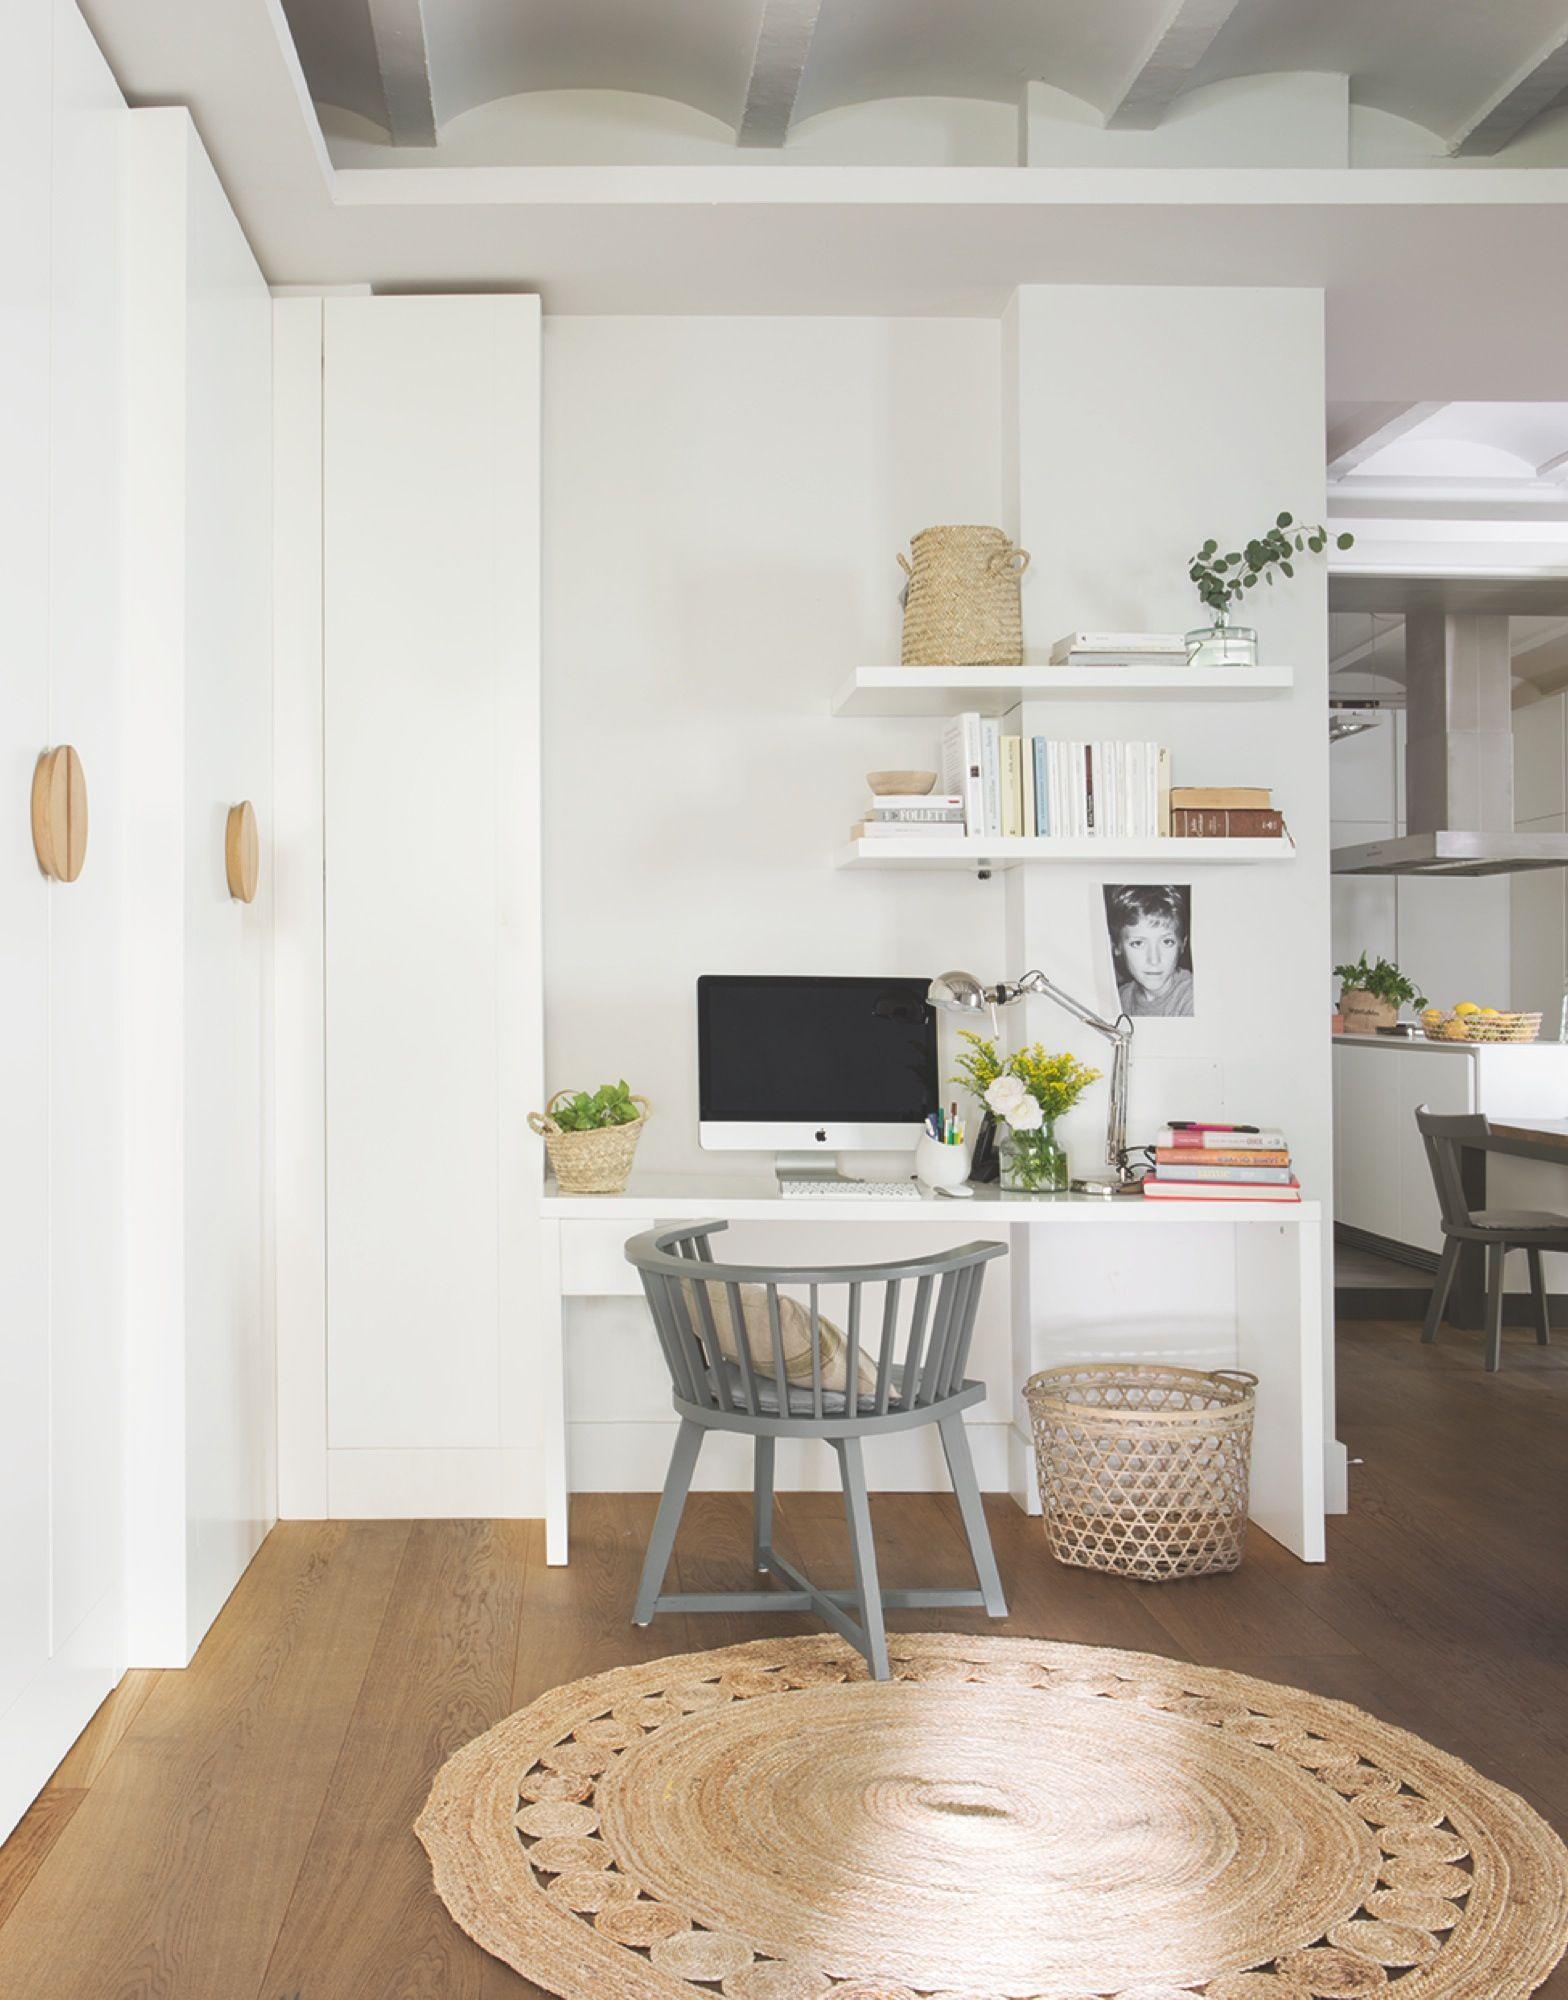 Vivir en un edificio medieval con decoraci n contempor nea for Ideas decoracion escritorio